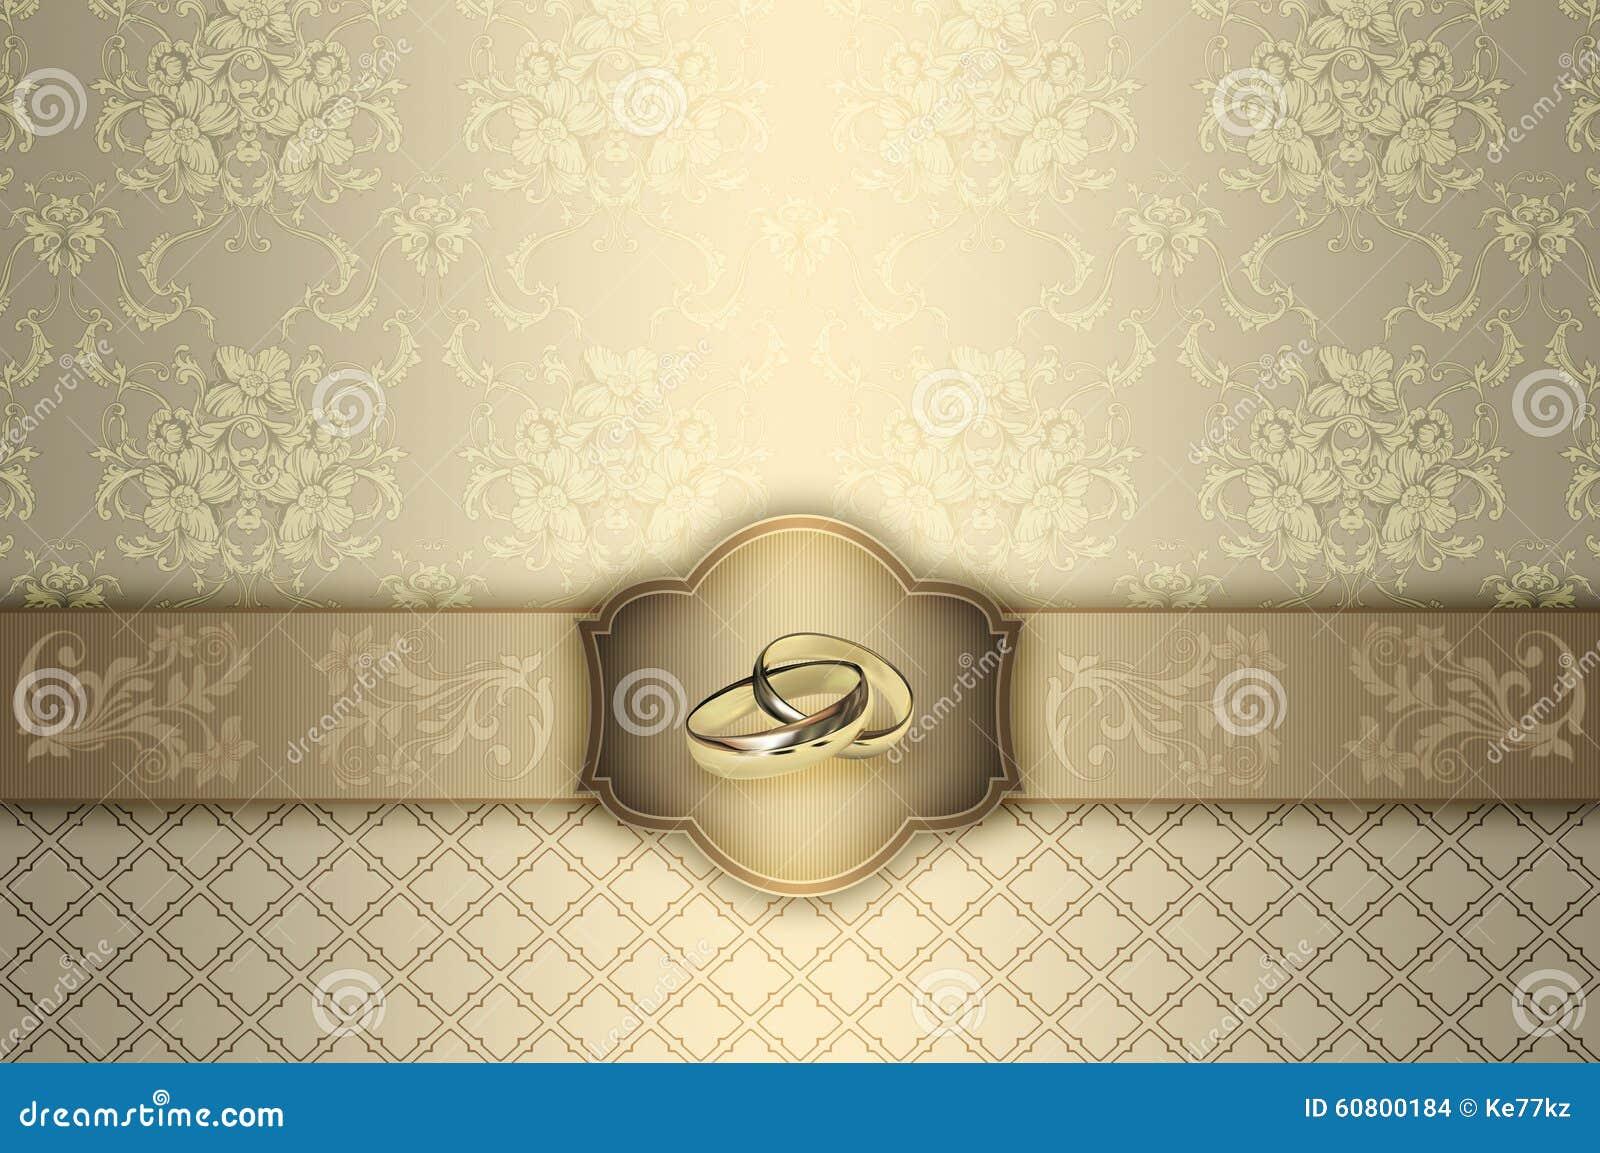 Wedding Invitation Card Design. Stock Illustration - Image ...